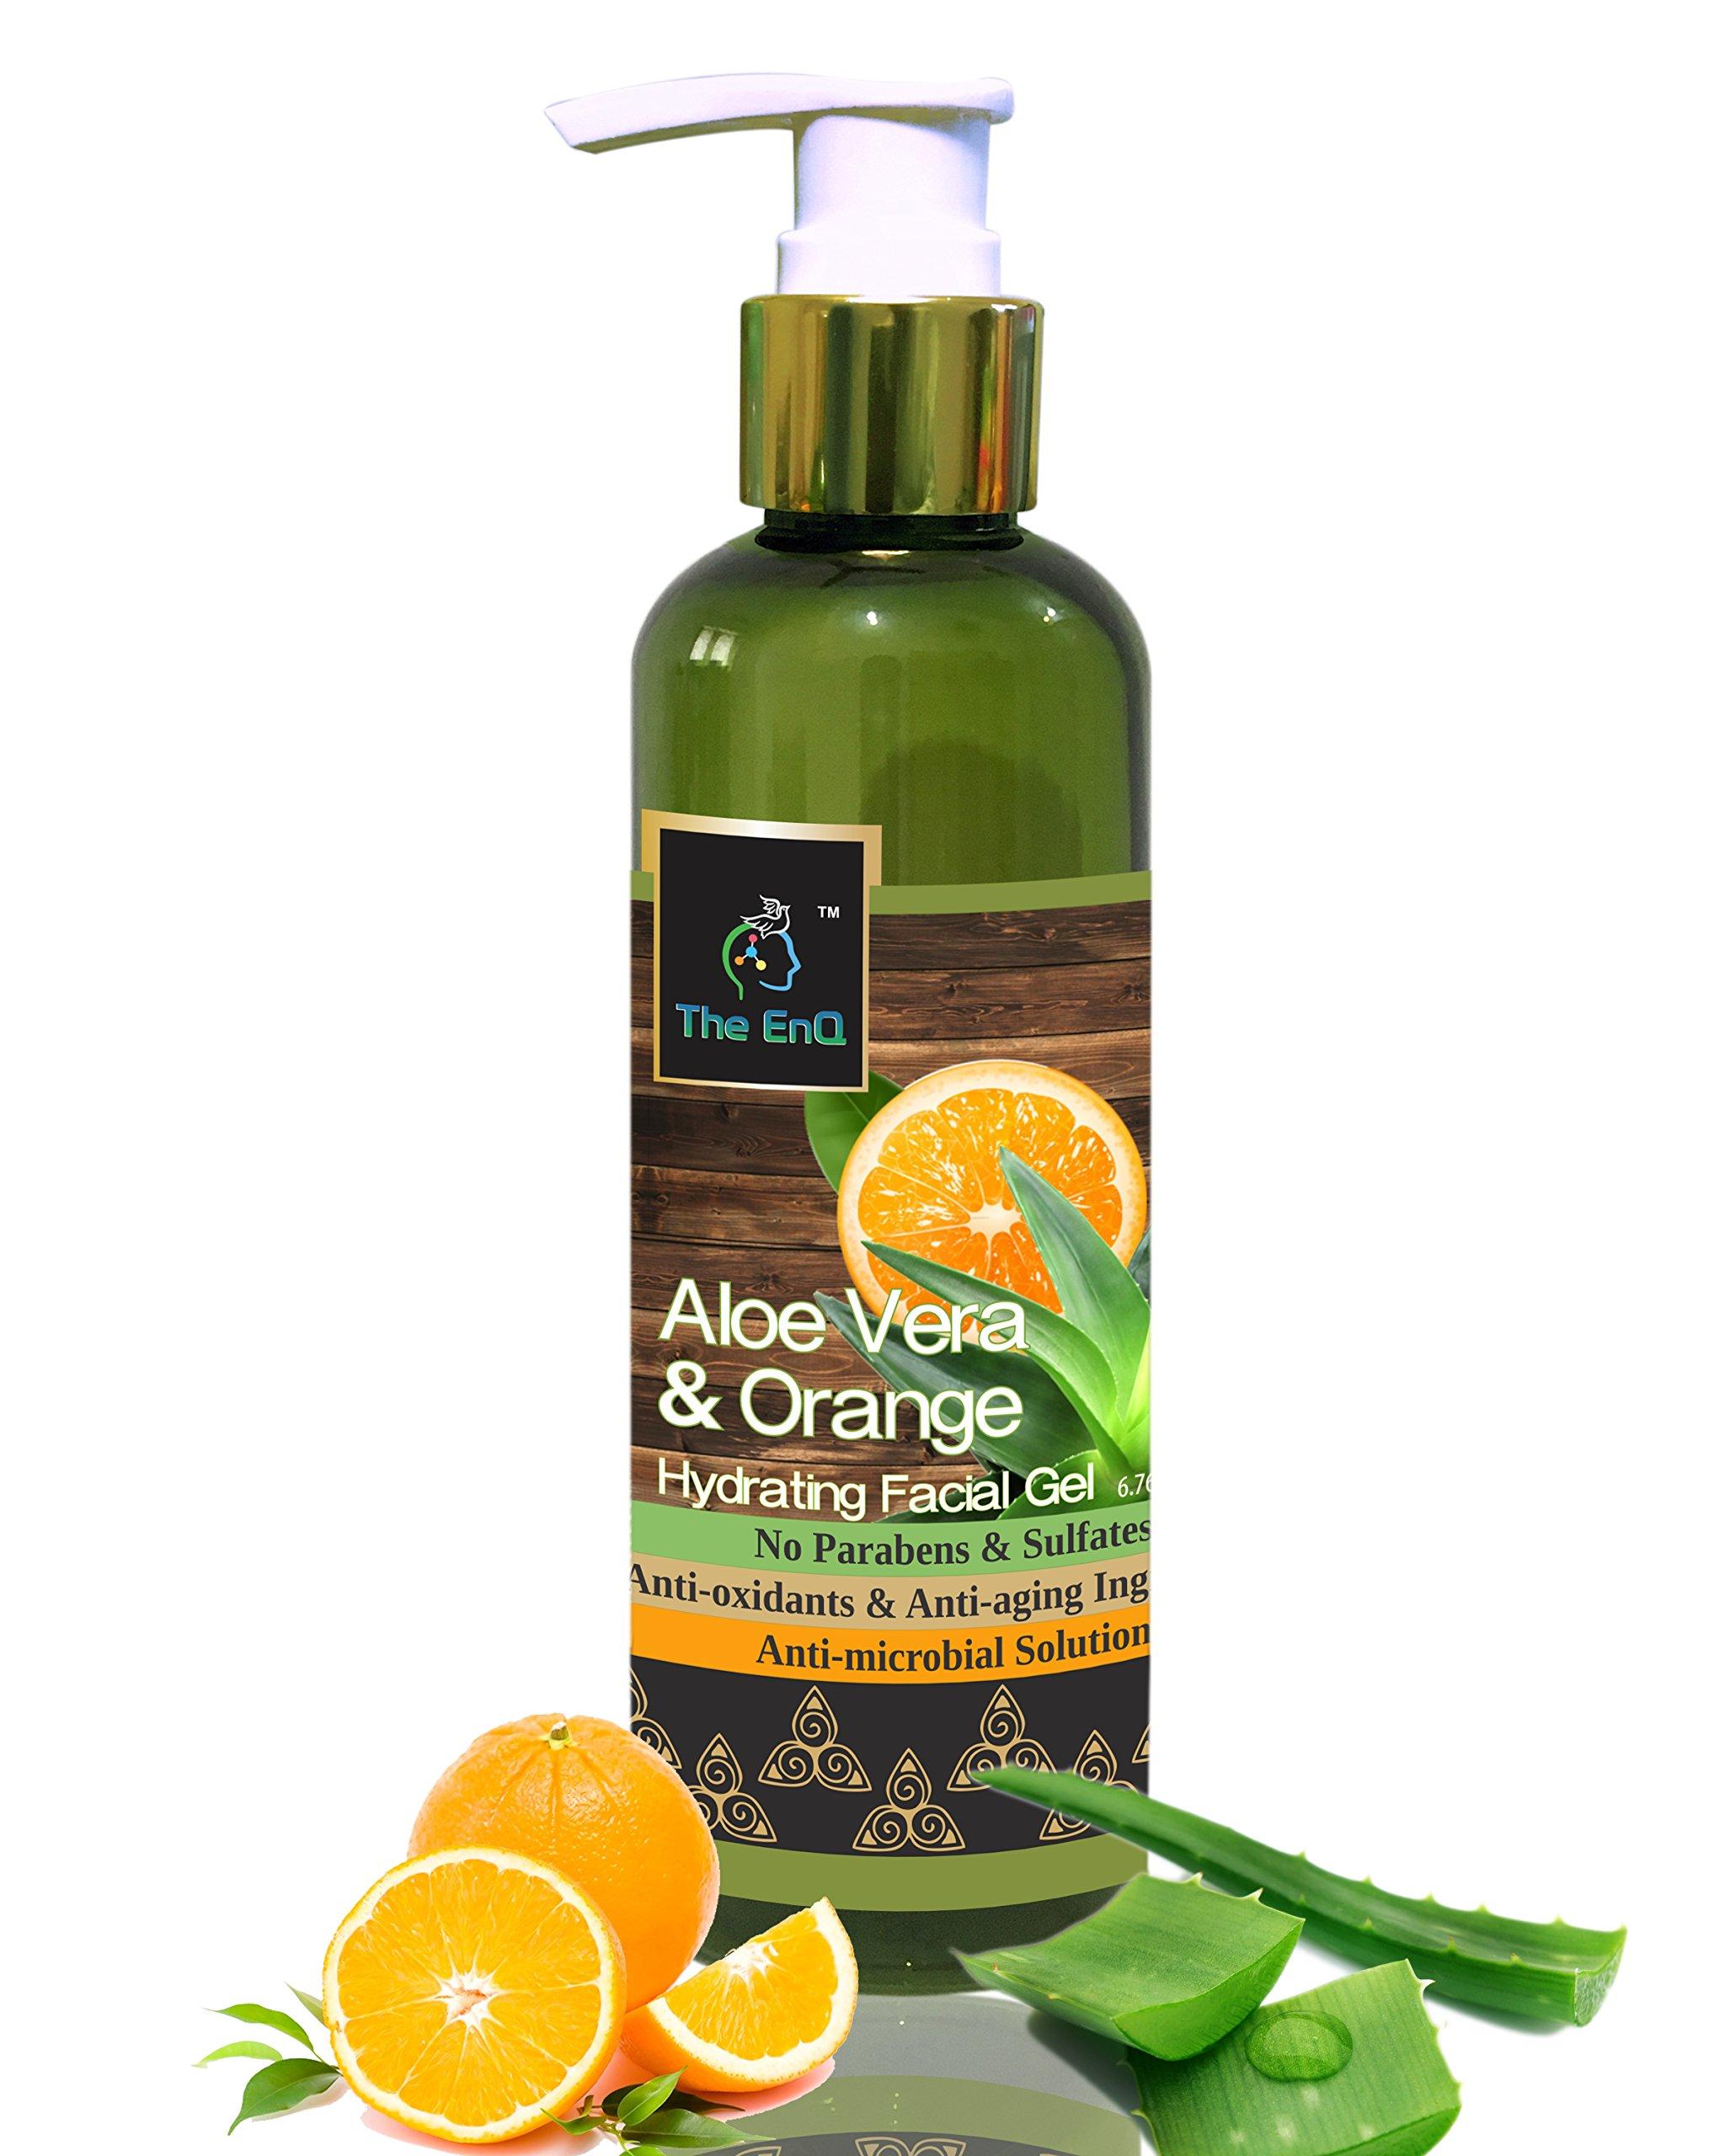 The EnQ Orange & Aloevera Hydrating Facial Gel 200ml/6.76 fl.oz - Paraben free refreshing facial gel - Skin Hydrating Gel, Moisturizer, anti-acne gel product image